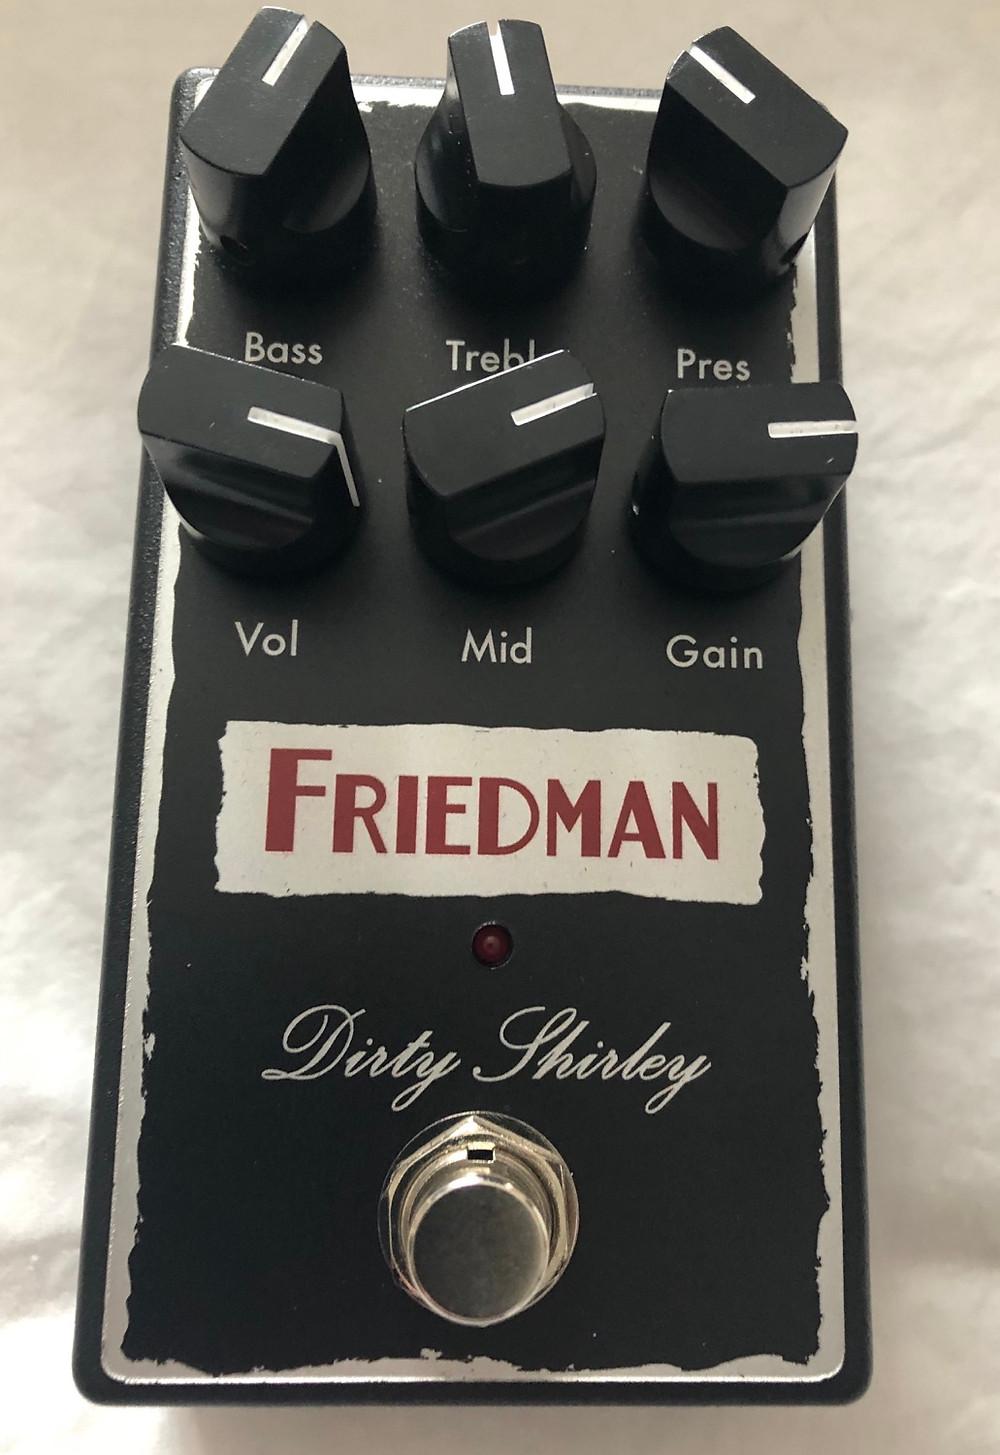 Friedman Dirty Shirley Overdrive Pedal vs BE OD